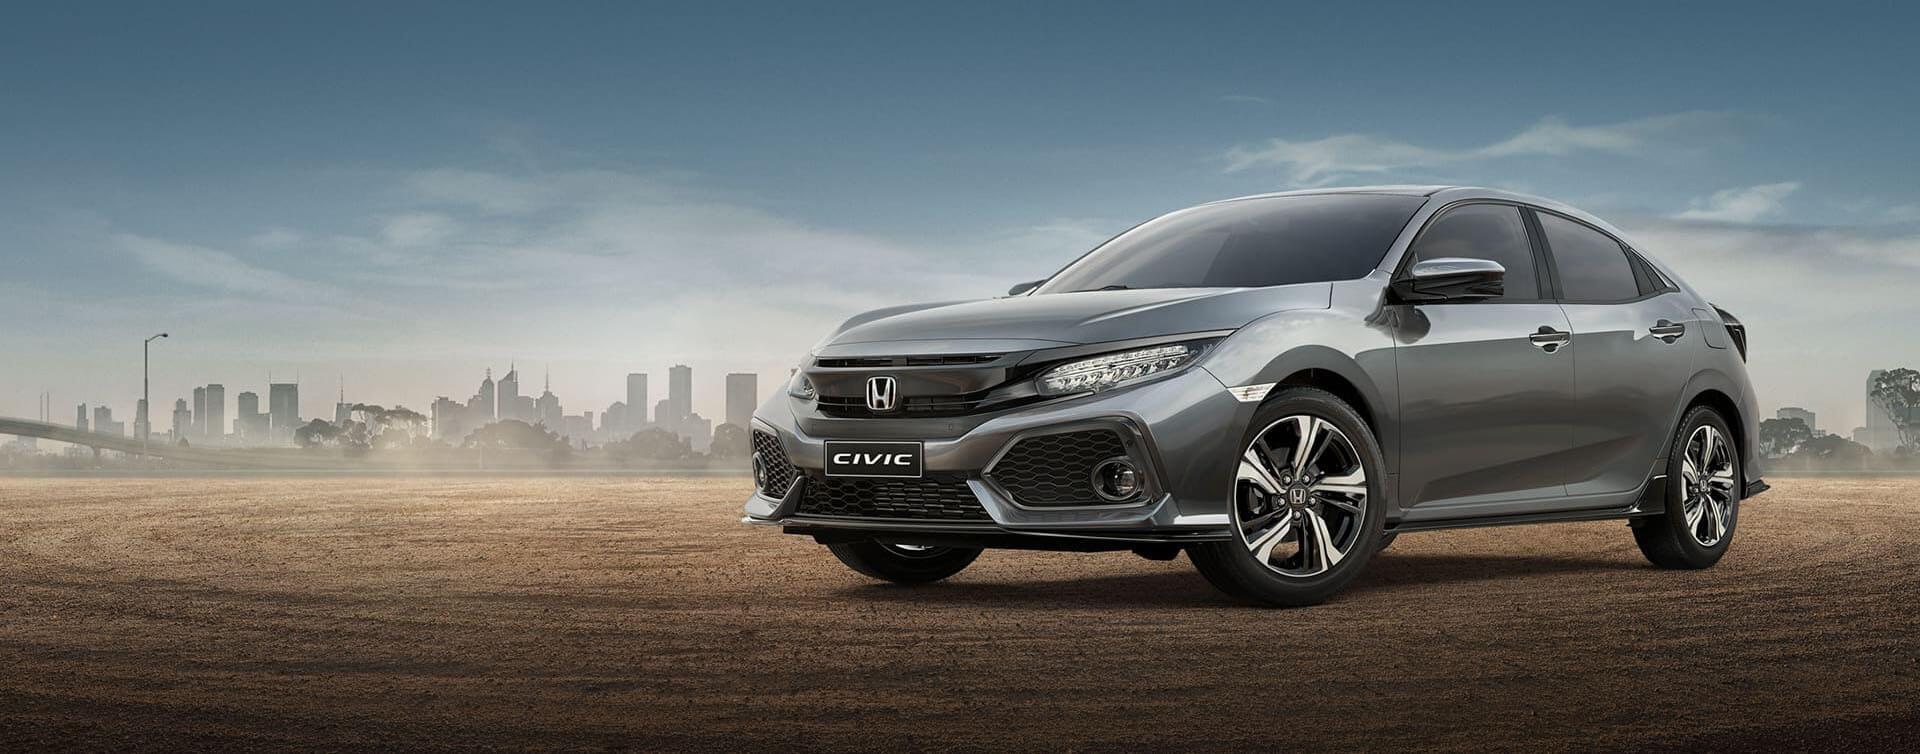 New Honda Civic Hatch for sale in Shepparton - Darryl Twitt